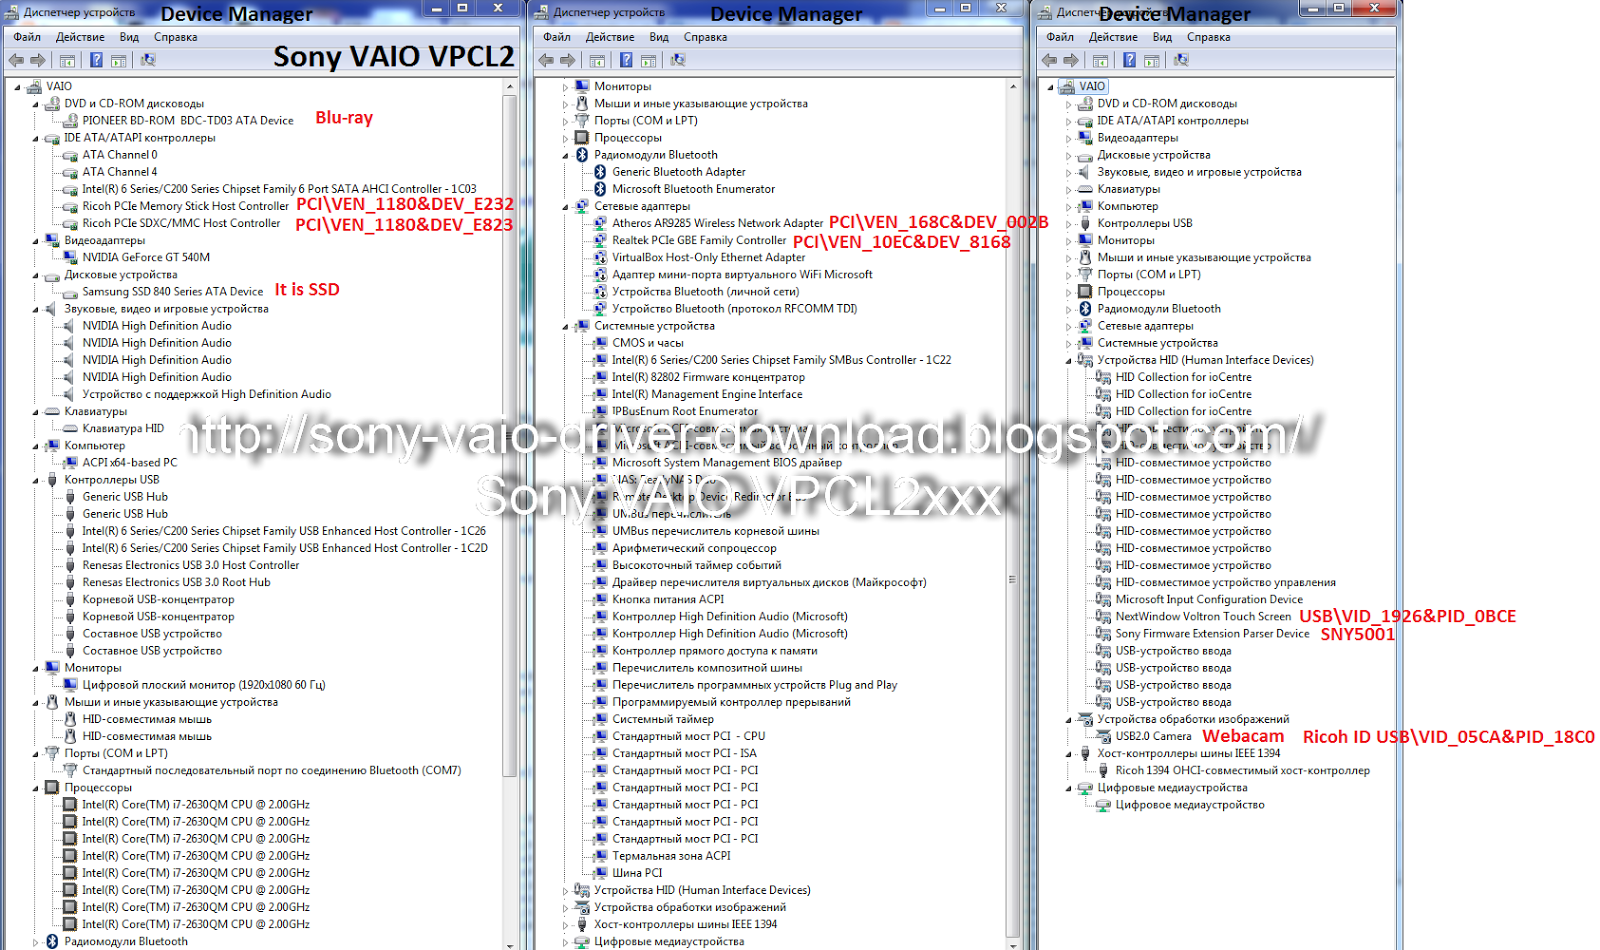 Sony VAIO L22, Sony VAIO VPC-L21S1R/B, Sony VAIO VPC-L22S1R/B, Sony VAIO VPC-L22Z1R/B, Sony VAIO VPCL213, Sony VAIO VPCL232FX/B, Sony VPCL216FX/B, VPCL214FX/B, VPCL218, Vpcl222fx, VPCL224, VPCL237, VPCL211FX, VPCL211FX/B, VPCL211FX/W, VPCL212FX, VPCL212FX/B, VPCL213FX, VPCL213FX/B, VPCL214FX, VPCL214FX/B,VPCL215FX, VPCL215FX/B, VPCL215FX/W,VPCL216FX, VPCL216FX/B, VPCL218FX, VPCL218FX/B,VPCL2190X, VPCL21AFX, VPCL21AFX/B, VPCL21BFX, VPCL21BFX/B, VPCL21SFX, VPCL21SFX/W, VPCL222FX, VPCL222FX/B, VPCL223FX, VPCL223FX/B, VPCL224FX, VPCL224FX/B, VPCL2290X, VPCL22CFX, VPCL22CFX/B, VPCL22DFX, VPCL22DFX/B, VPCL22SFX, VPCL22SFX/W, VPCL231FX, VPCL231FX/B, VPCL231FX/W, VPCL232FX, VPCL232FX/B, VPCL233GX, VPCL233GX/B, VPCL234FX, VPCL234FX/B, VPCL234FXW, VPCL235FX, VPCL235FX/B, VPCL236FX, VPCL236FX/B, VPCL236FX/W, VPCL237FX, VPCL237FX/B, VPCL237FX/W, VPCL2390X, VPCL23AFX, VPCL23AFX/B, VPCL23AFX/W, VPCL23BFX, VPCL23BFX/B,VPCL23BFX/W, VPCL23CFX, VPCL23CFX/B, VPCL23CFX/W